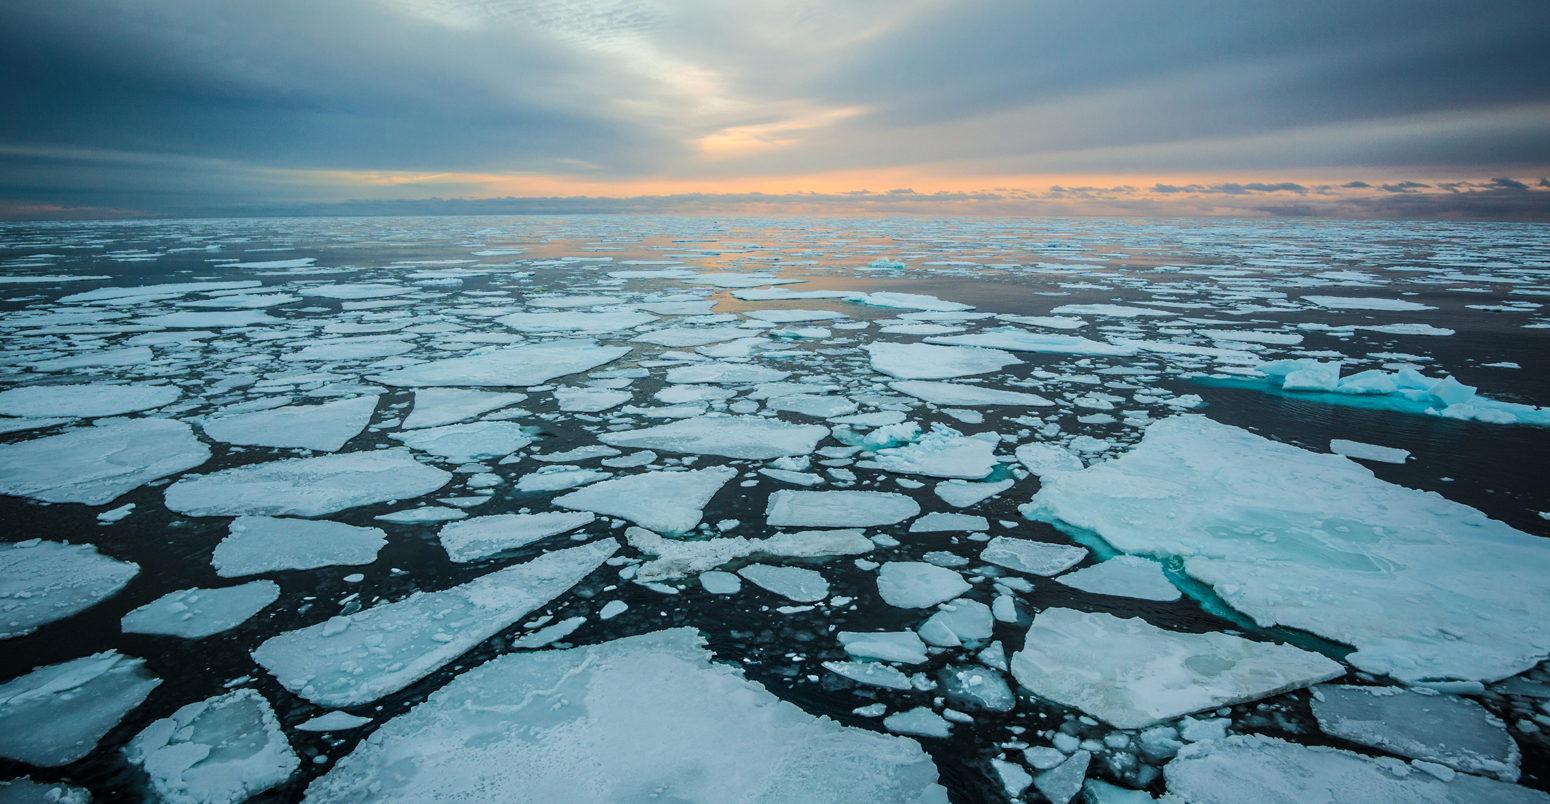 arktik bölgede plastik